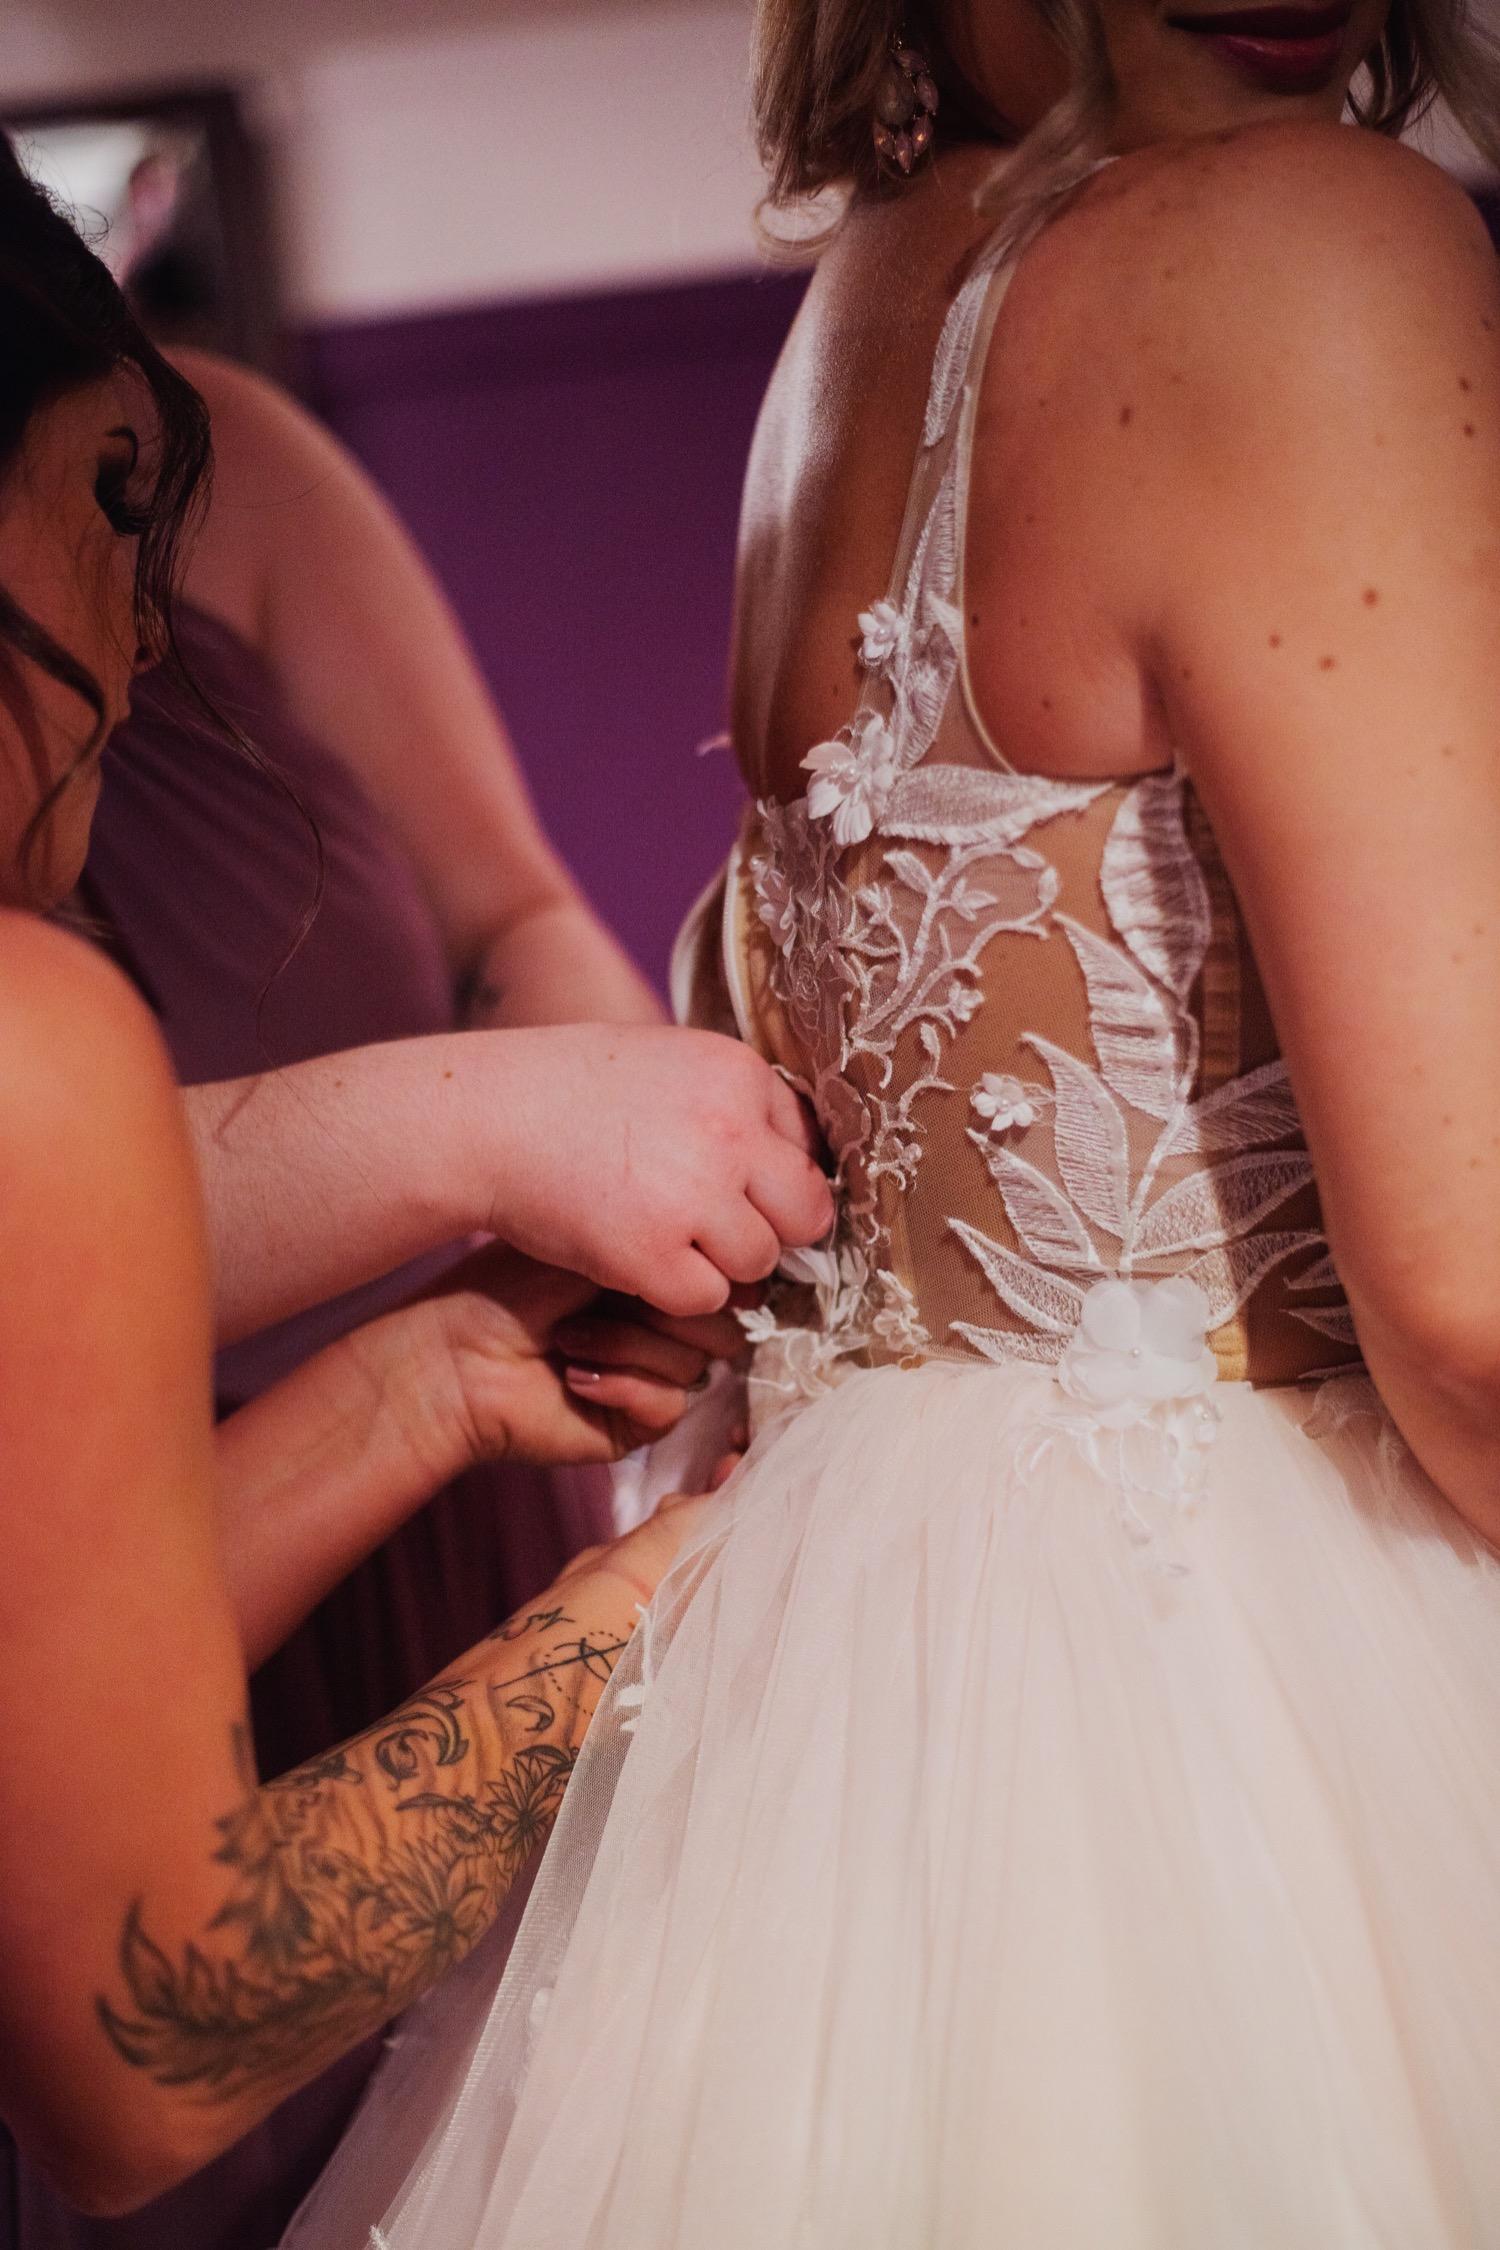 018_Benckendor-TheSilverFox-Streator-Wedding_0028.jpg